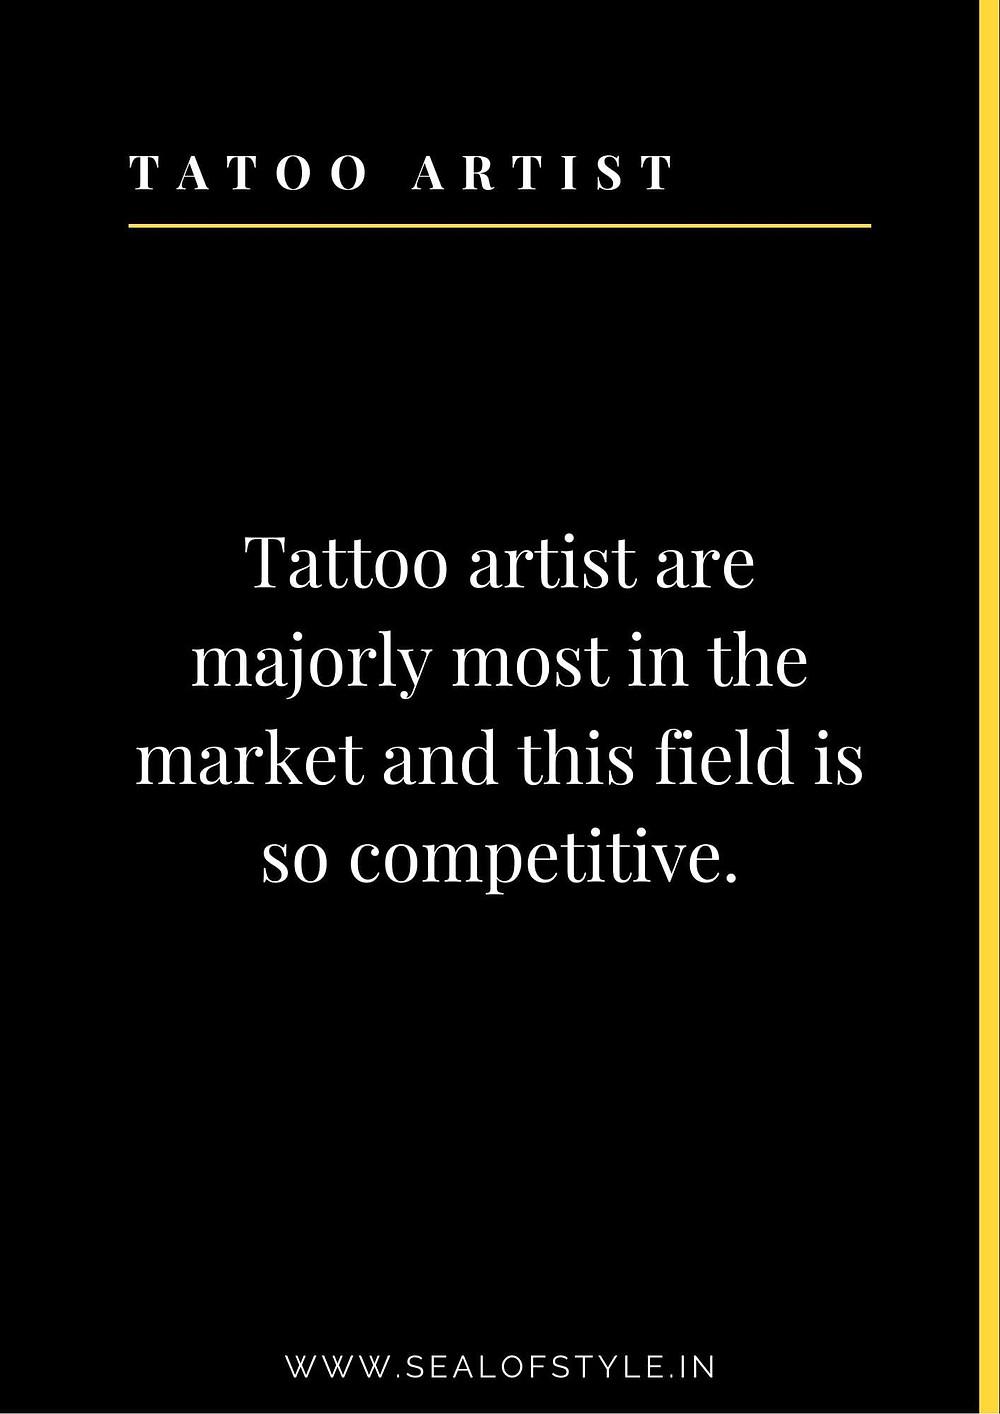 Information about tattoo artist.